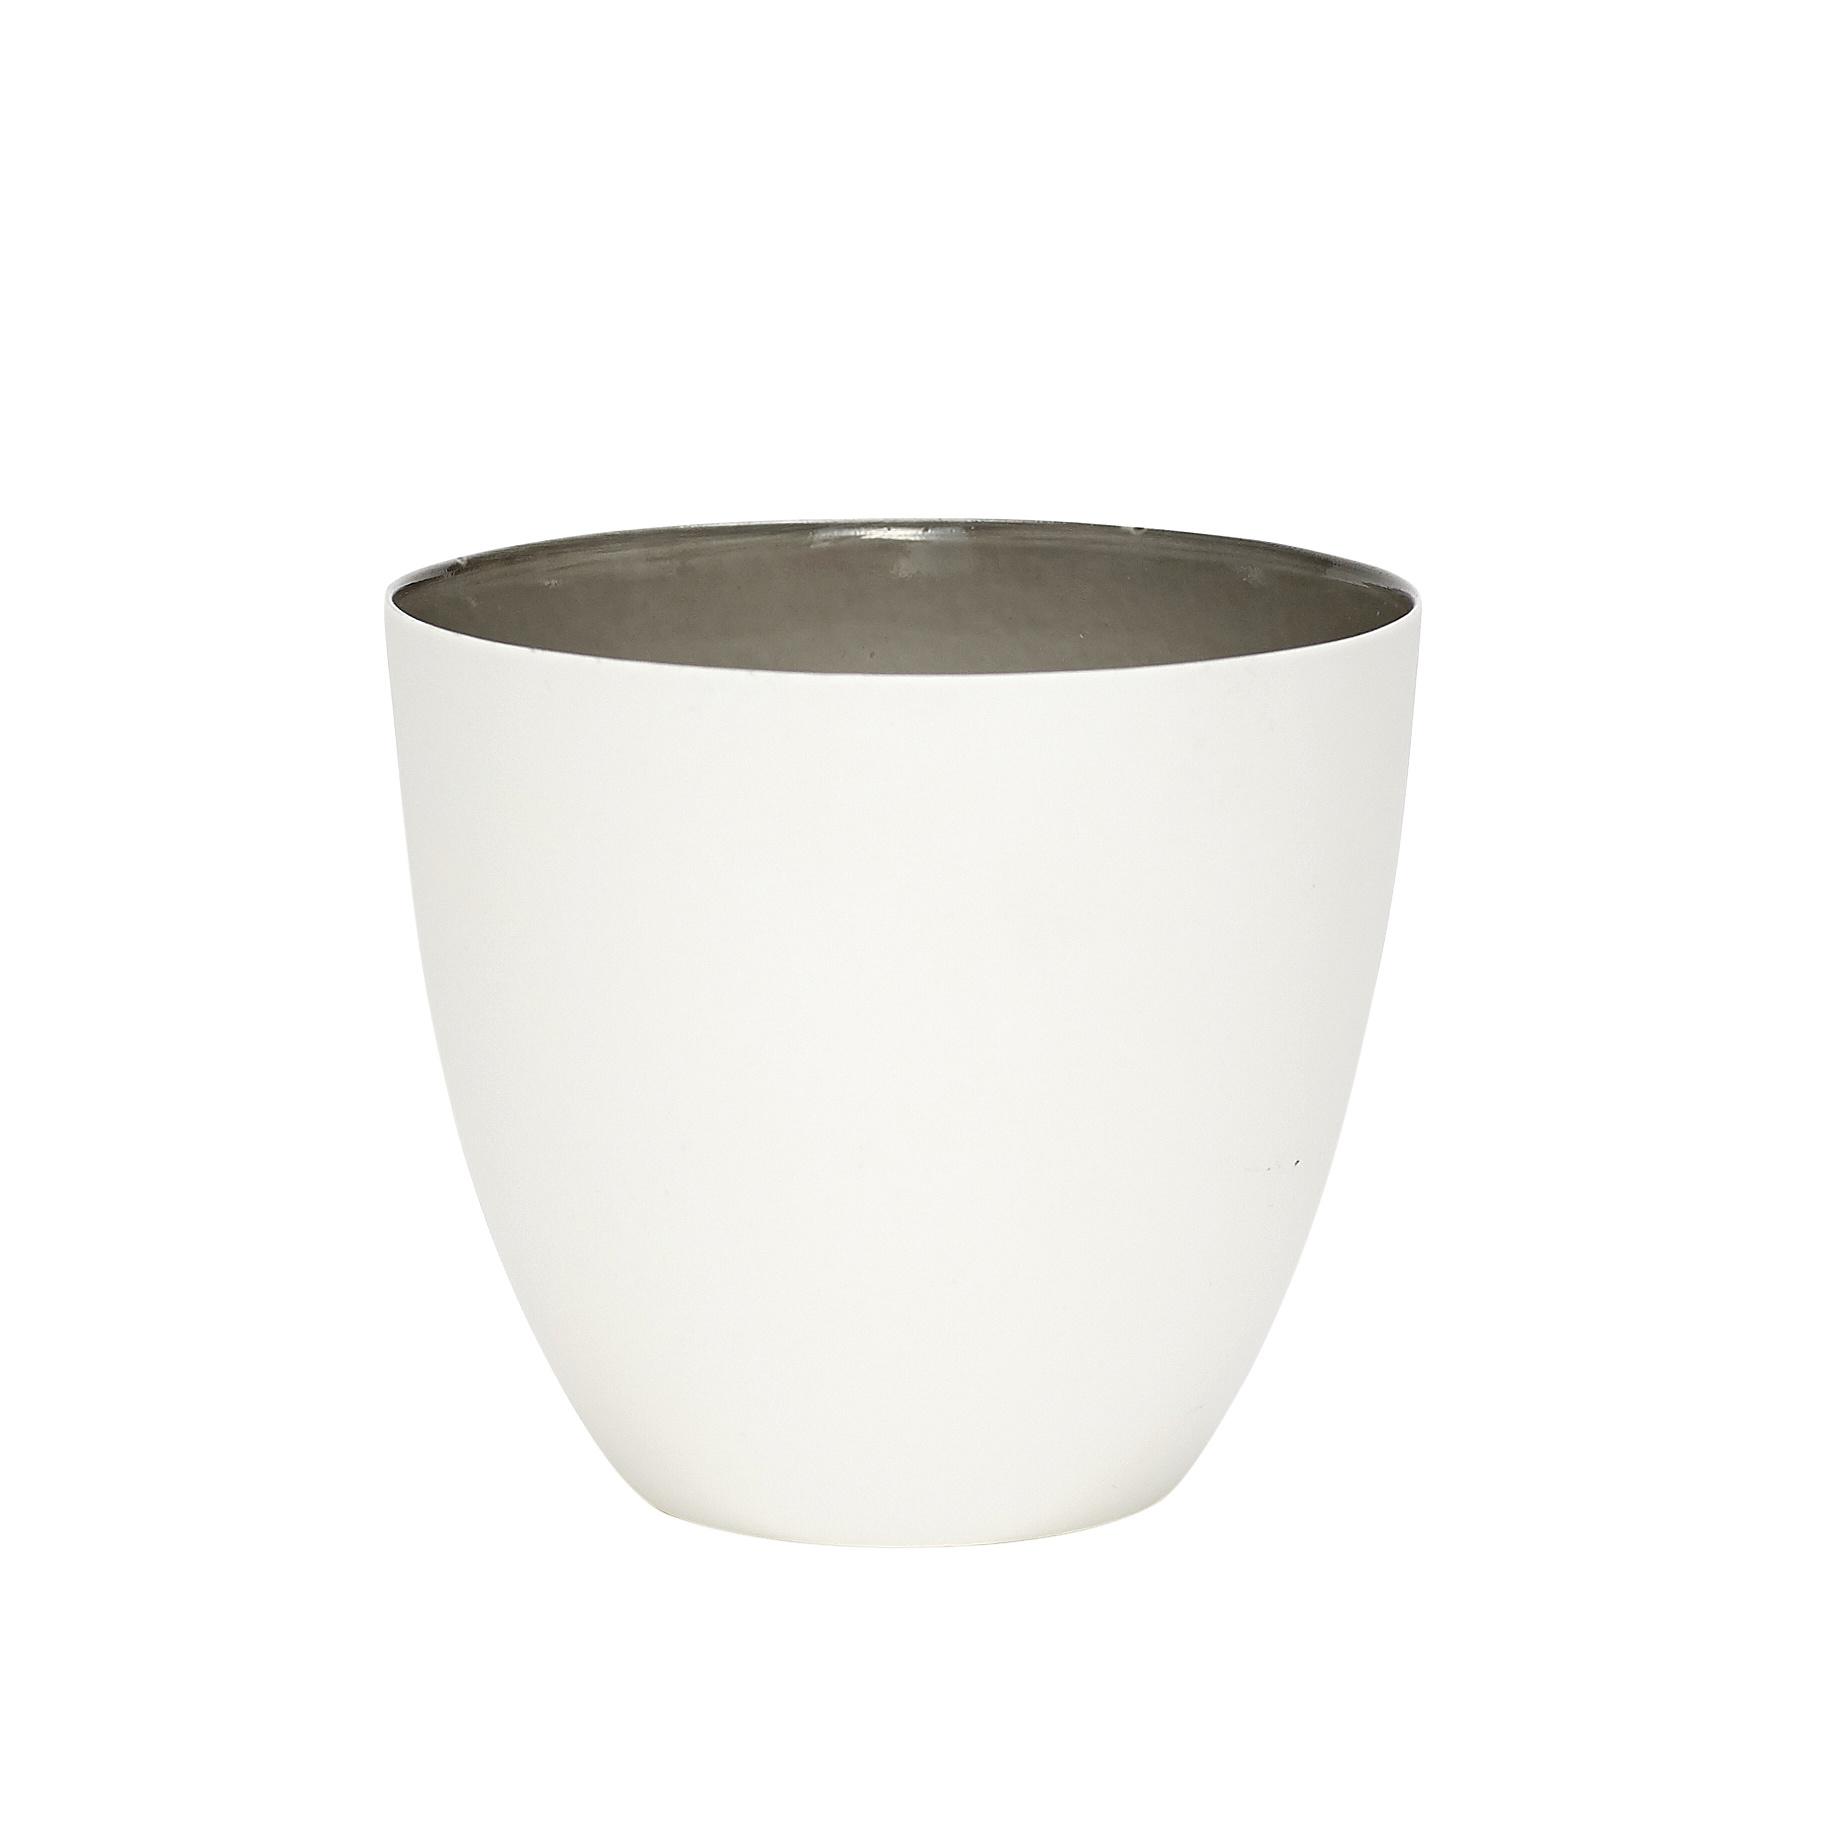 Hubsch Theelichtglas, porselein, grijs kleurverloop / wit